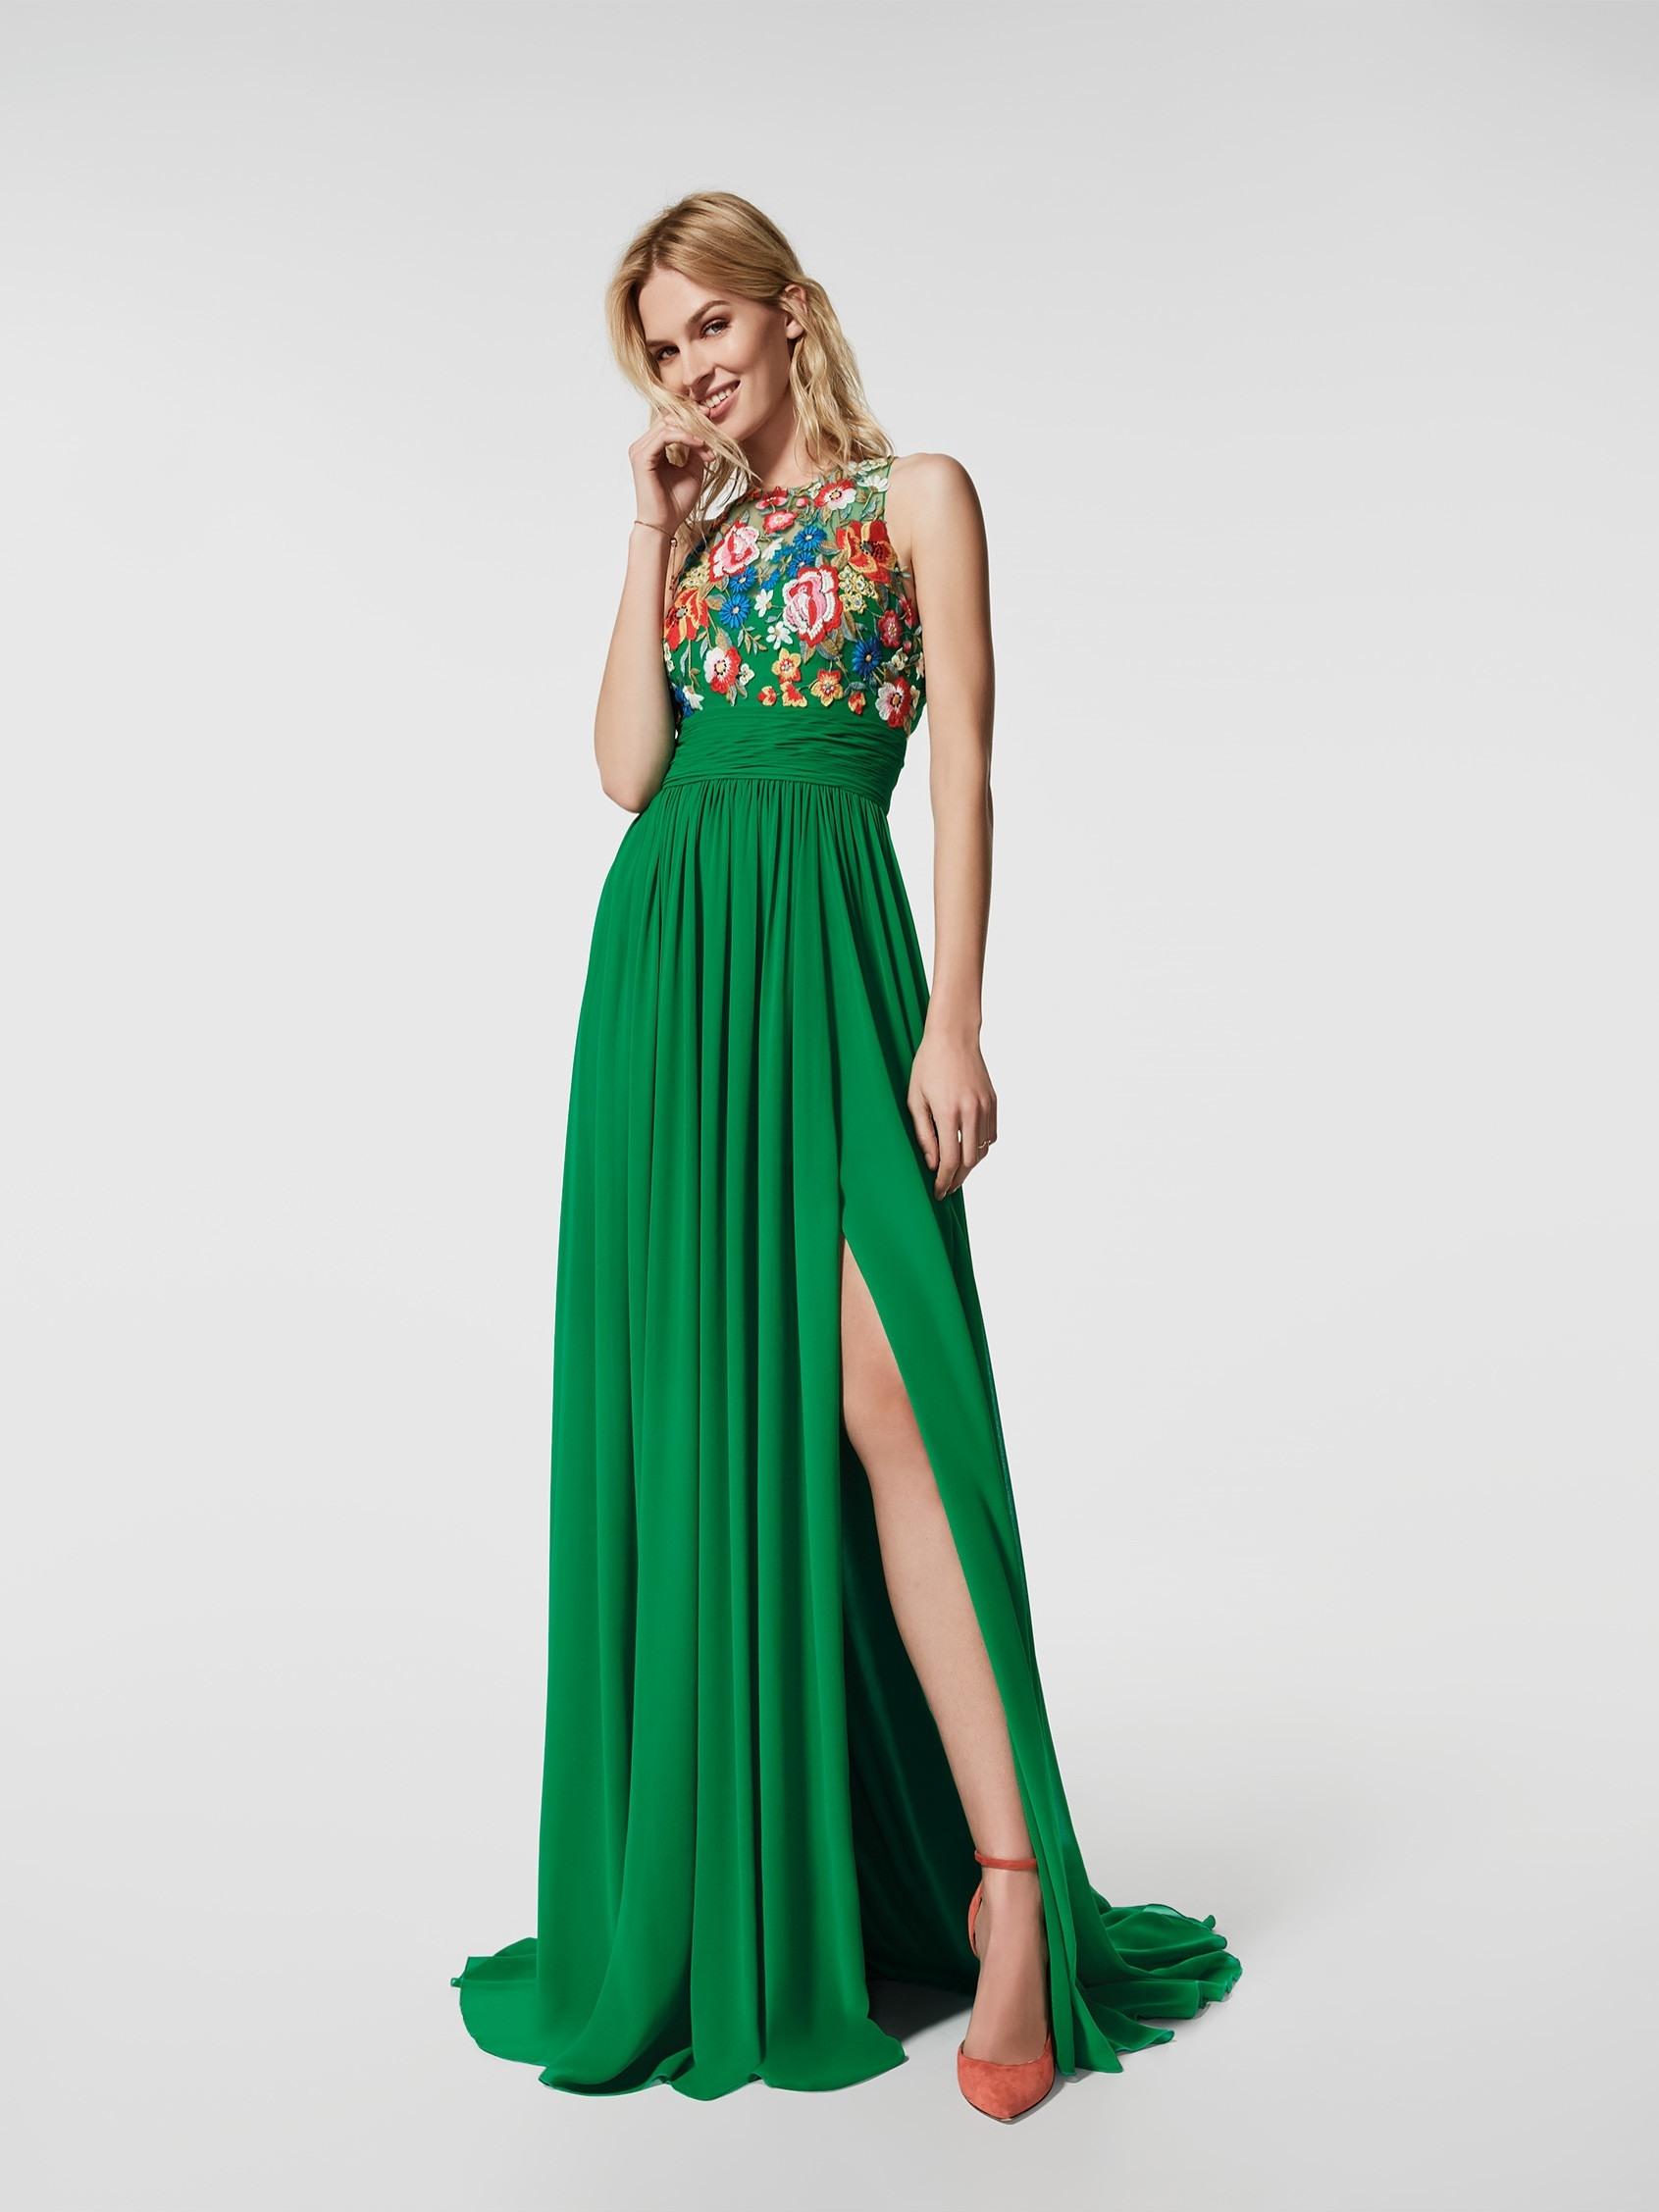 Formal Luxurius Abendkleid Lang Grün Ärmel - Abendkleid